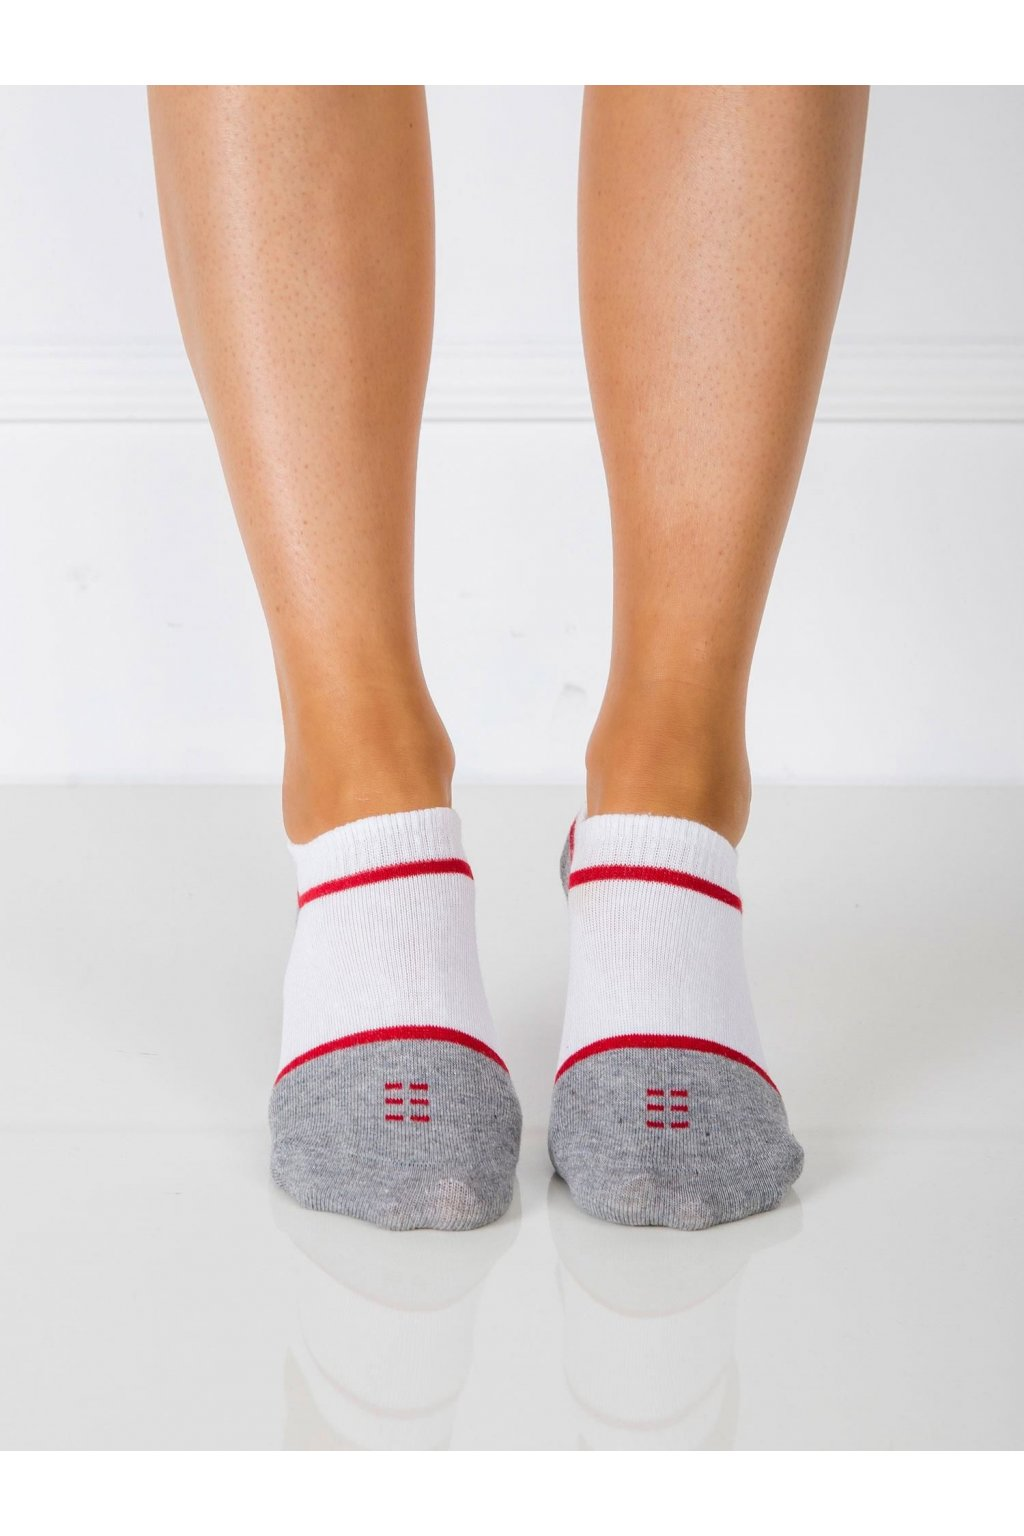 Dámske ponožky kód WS-SR-5563